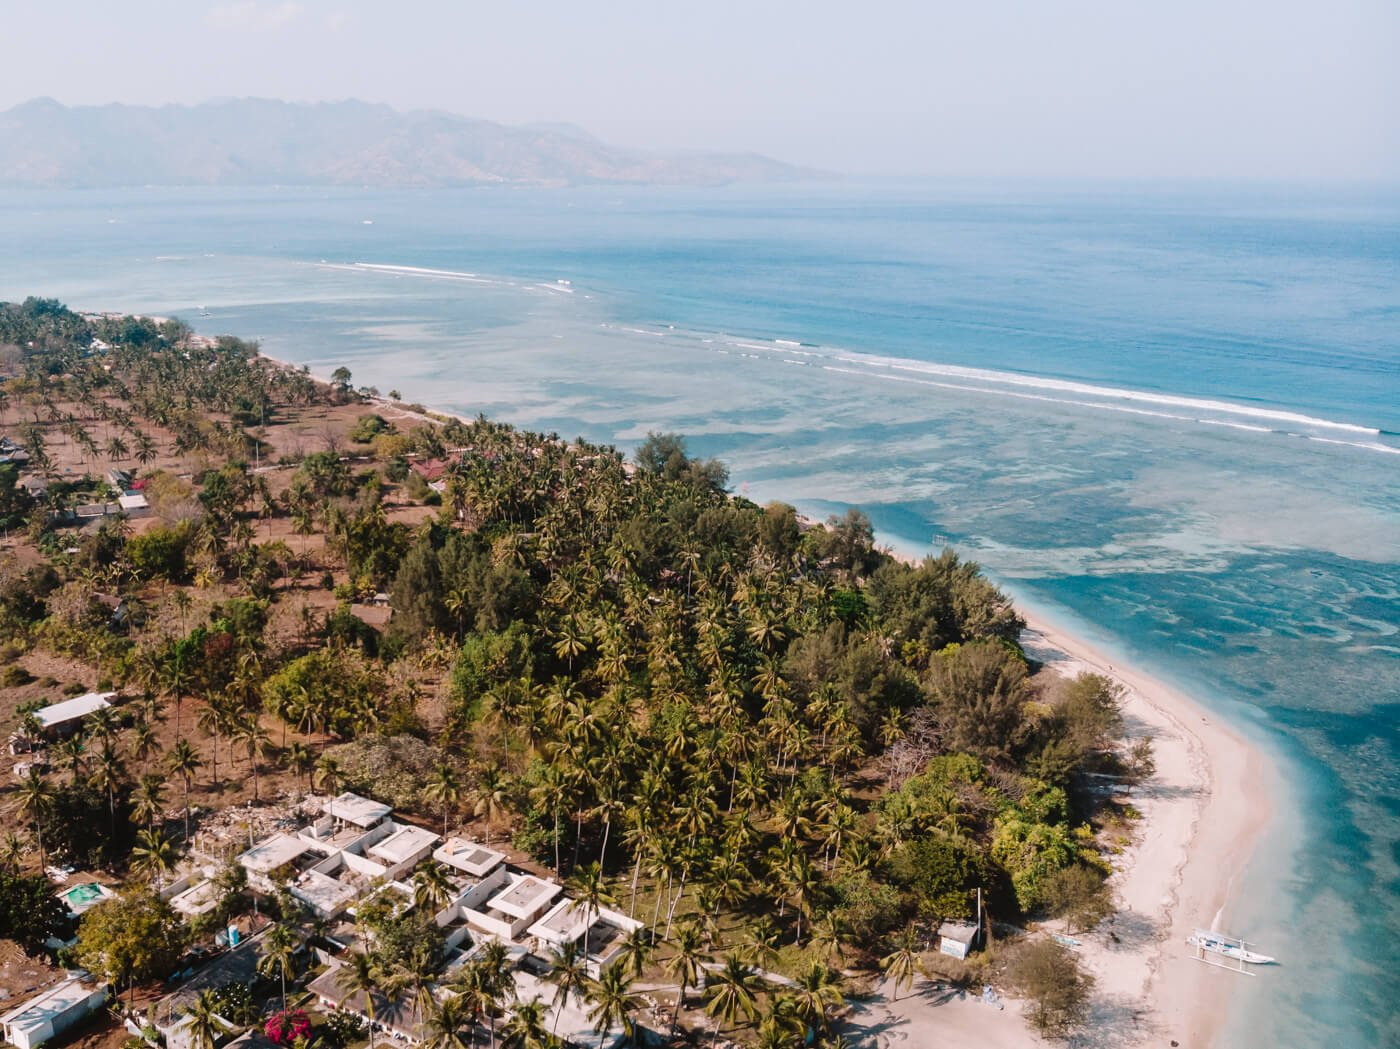 Roteiro Indonésia - Gili Air